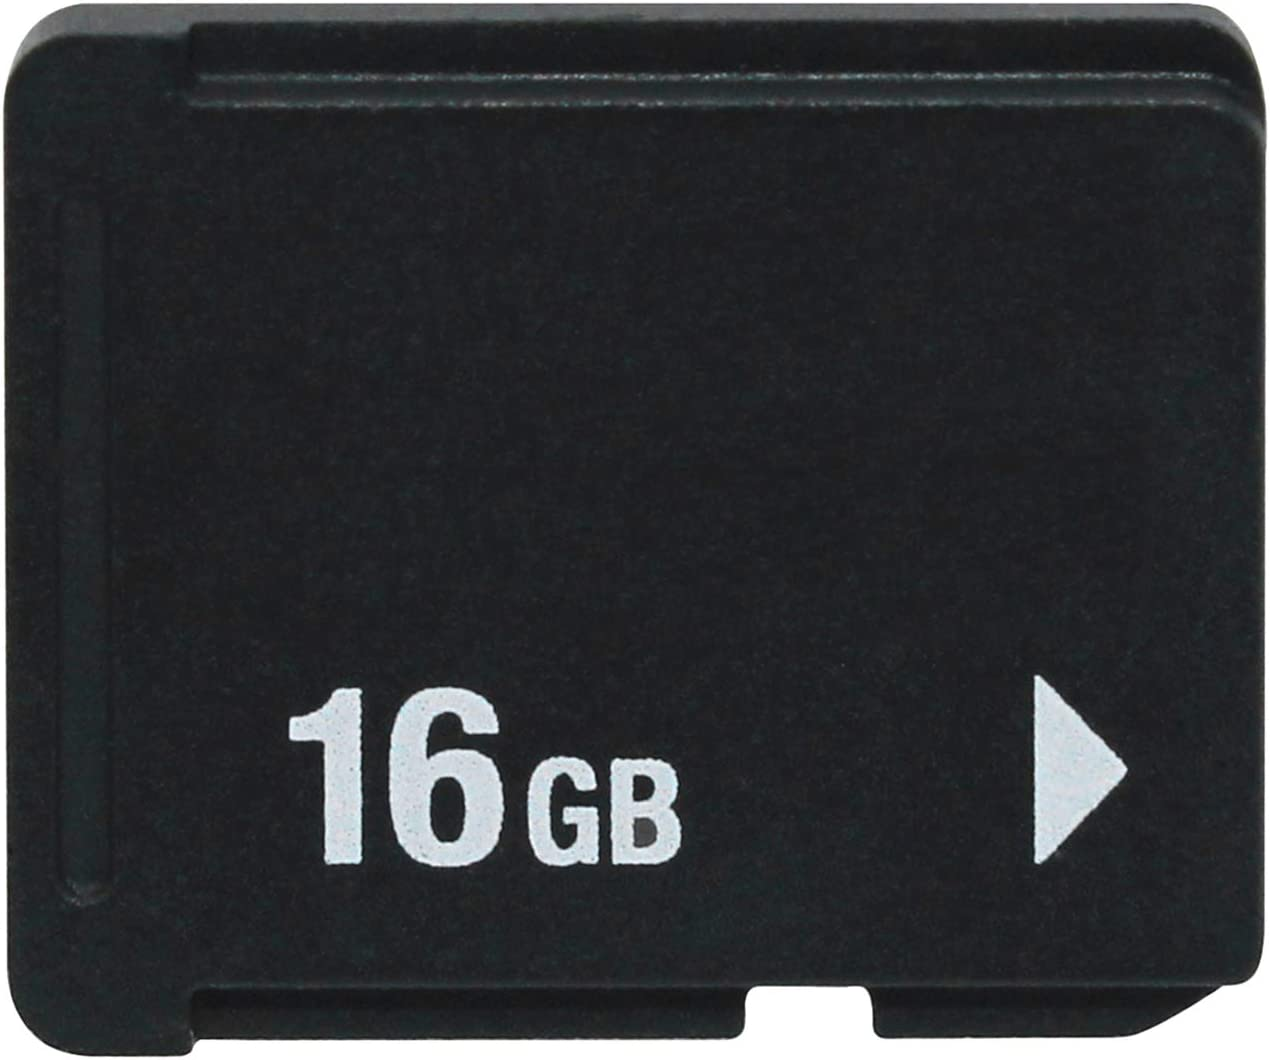 Amazon.com: OSTENT 16GB Memory Card Stick Storage for Sony ...